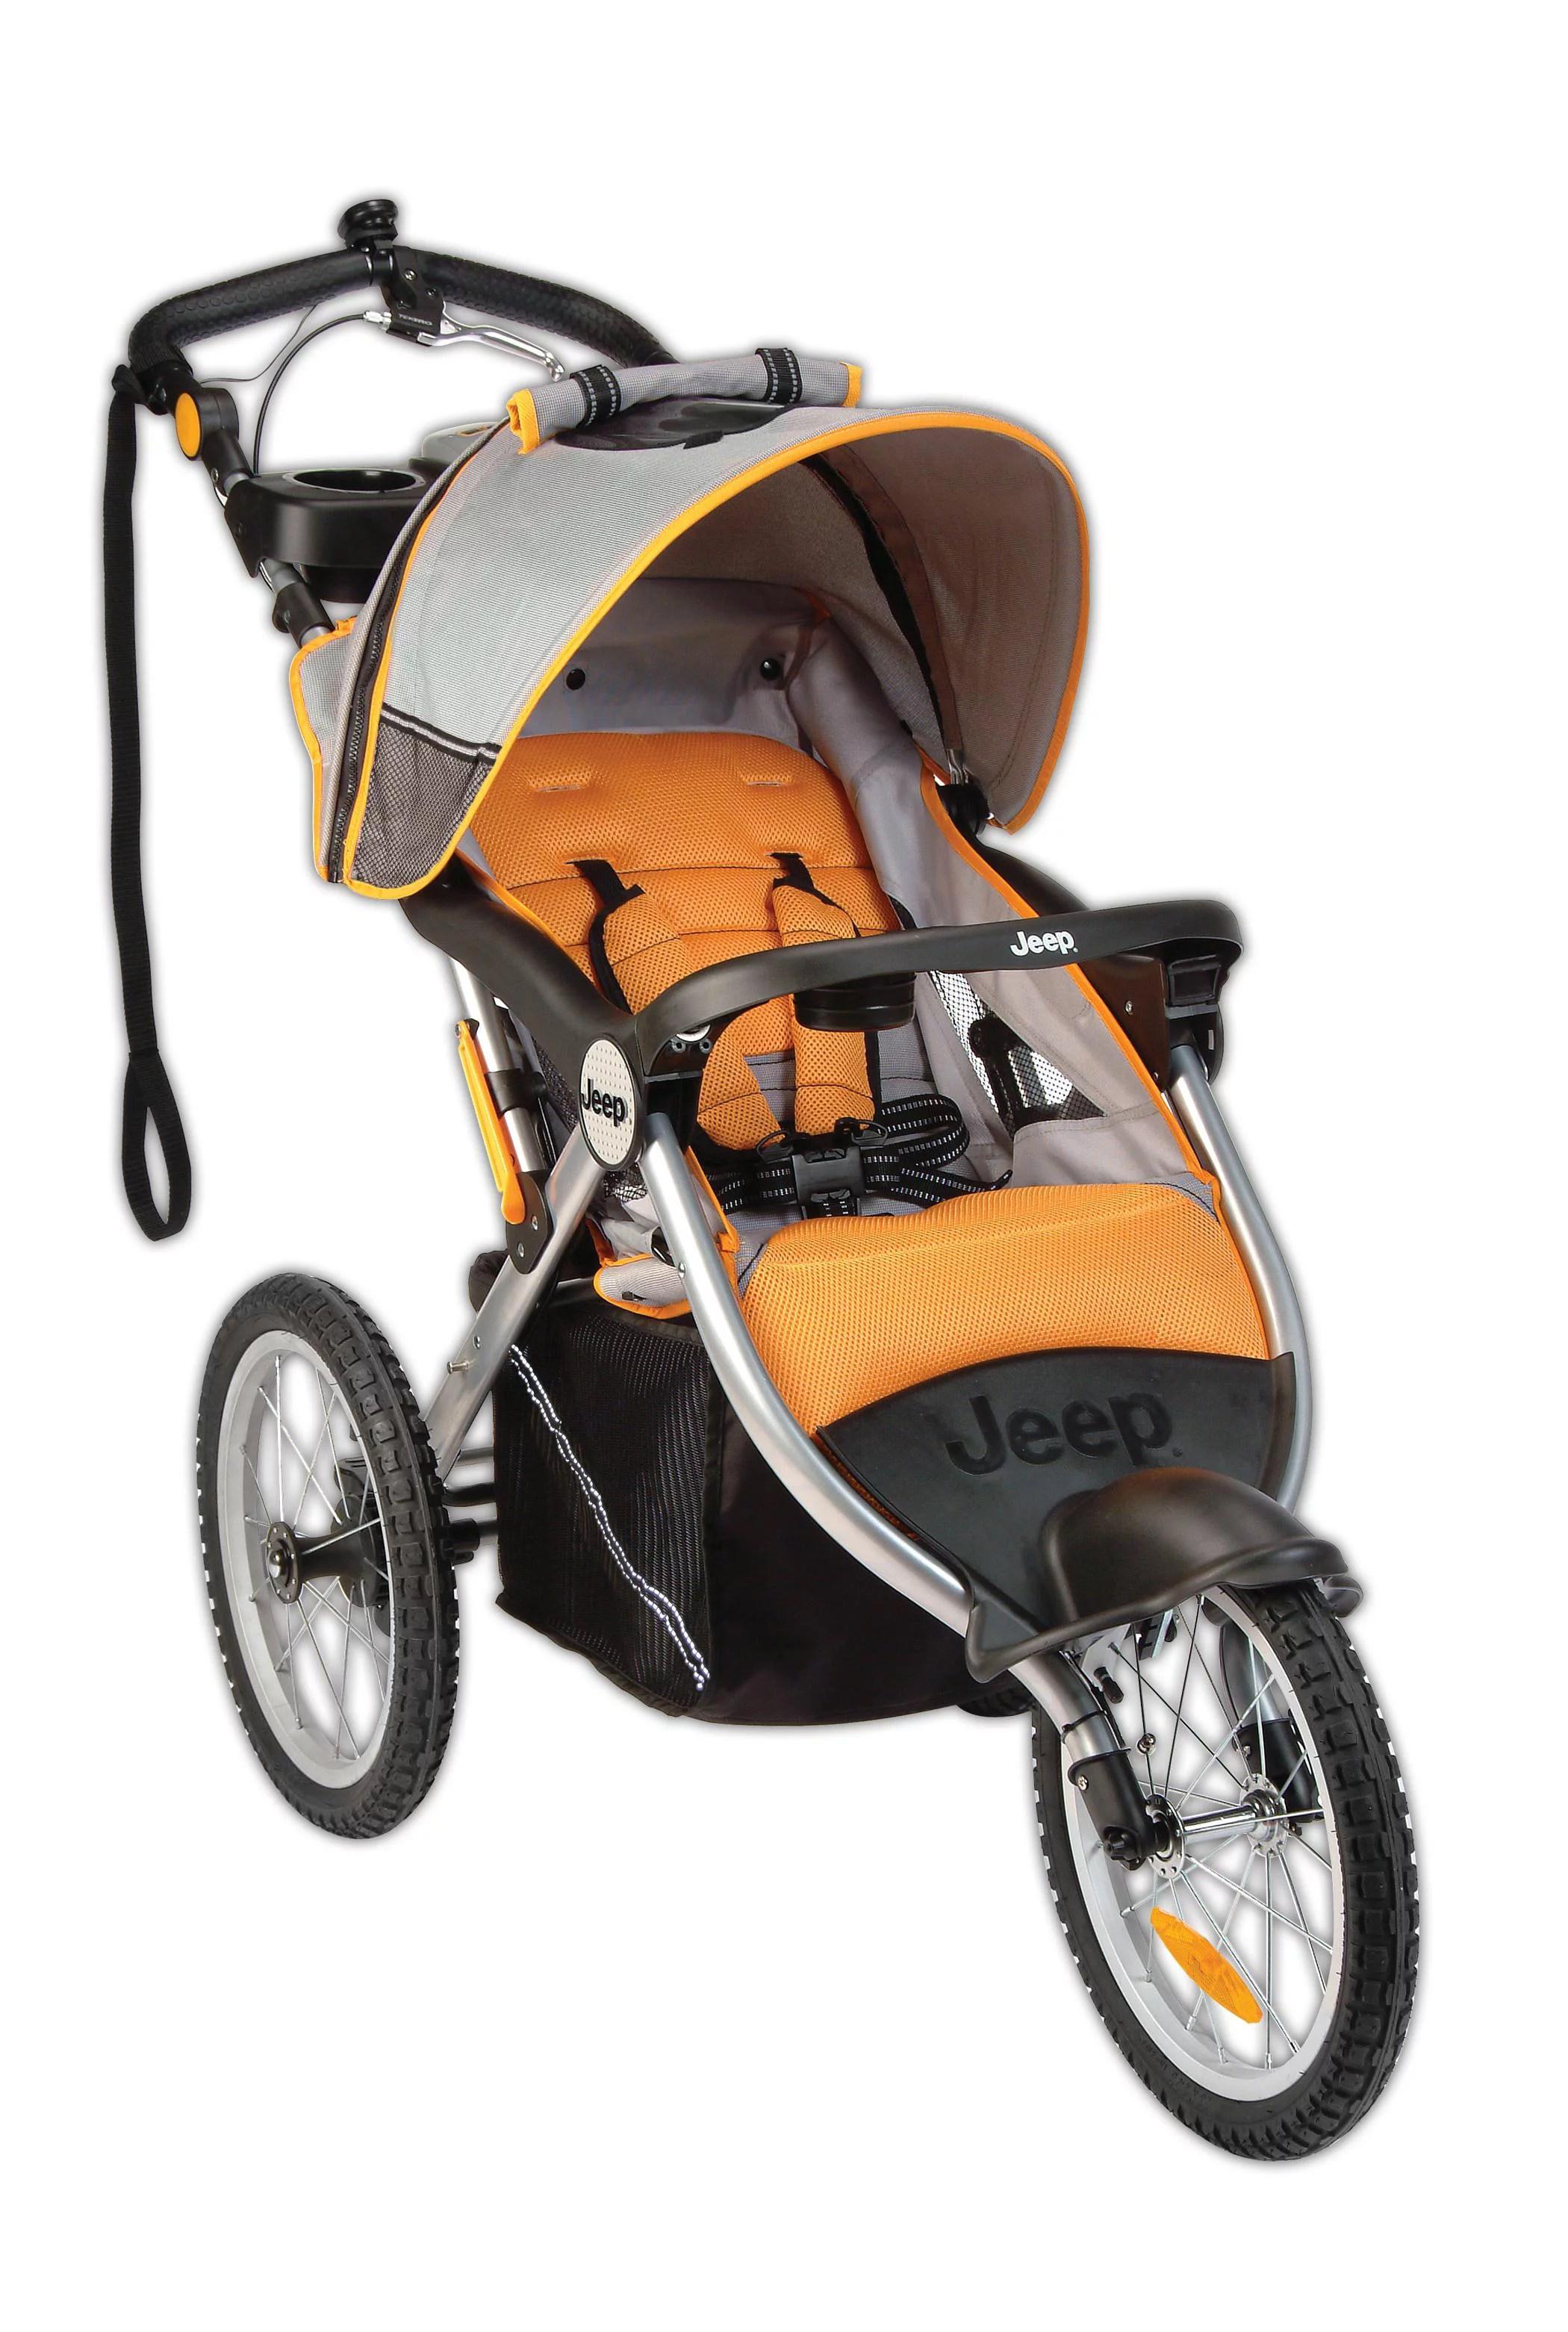 Jeep Jogger Stroller Recall : jogger, stroller, recall, Overland, Limited, Jogging, Stroller, Walmart.com